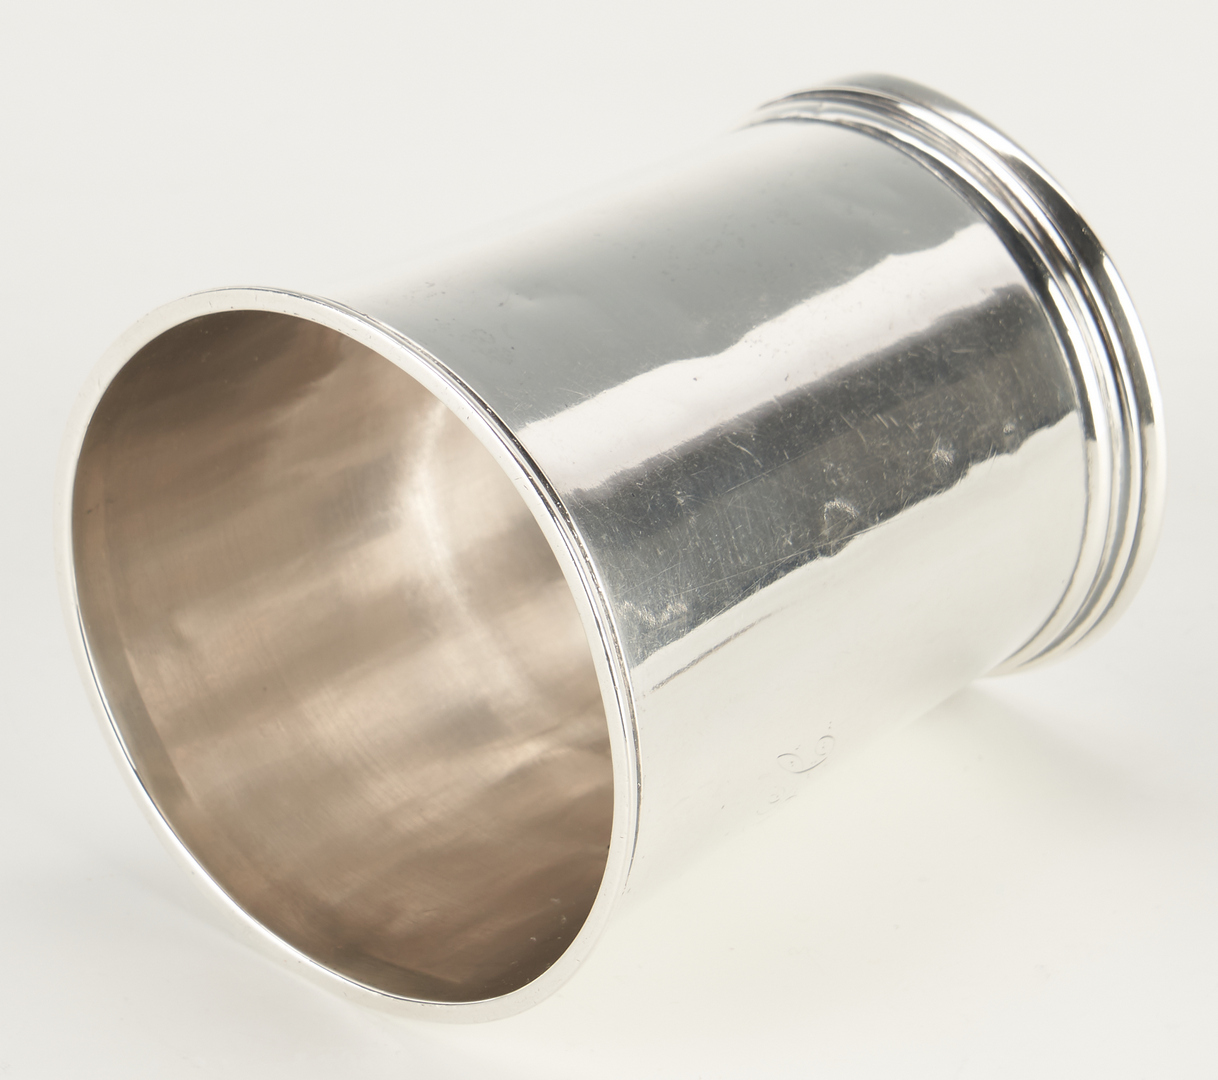 Lot 303: KY Coin Silver Julep Cup, Cutler, Lexington